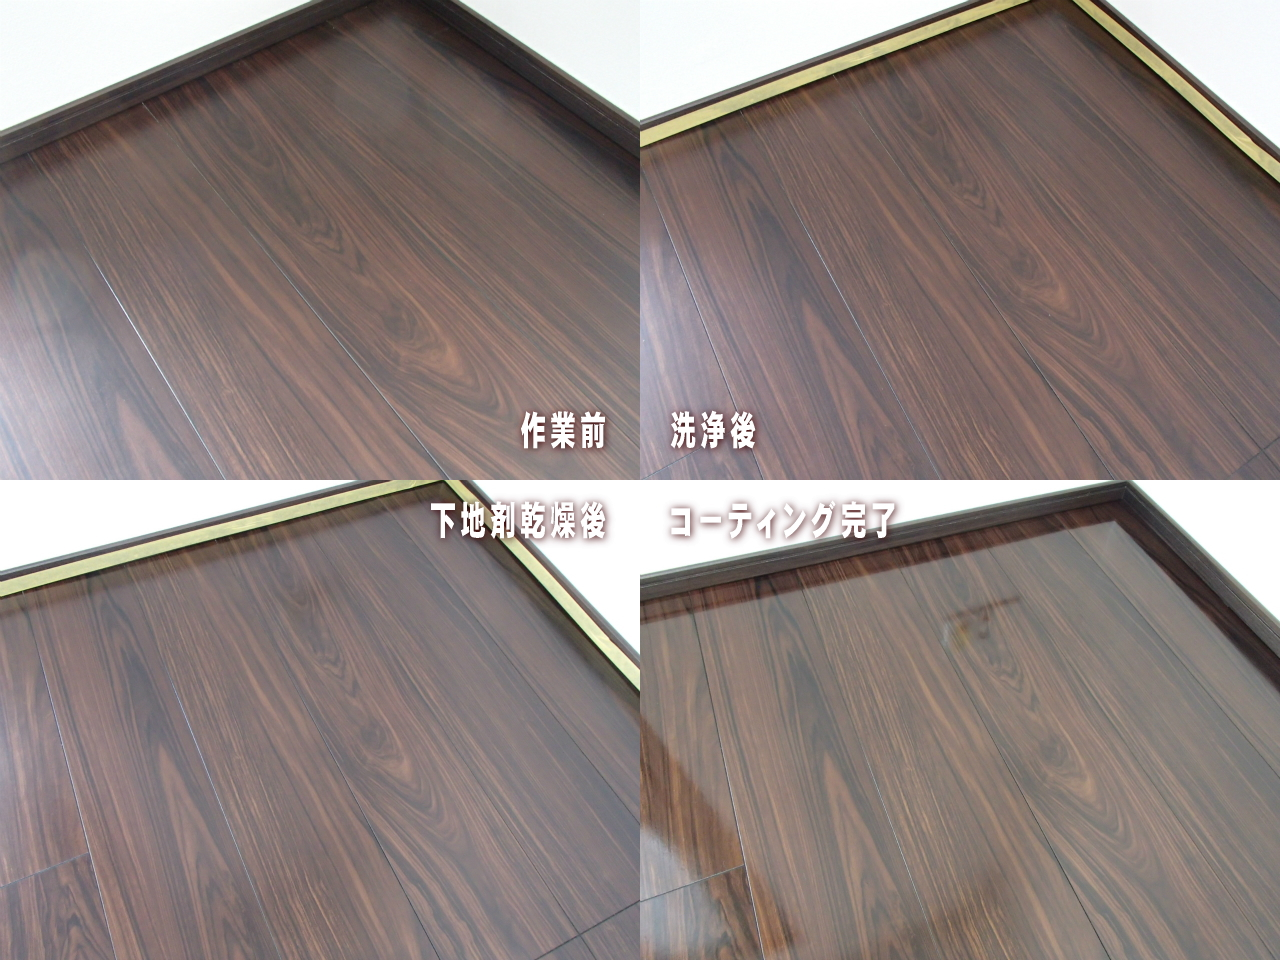 http://ajras.net/images/130306-coating4.jpg